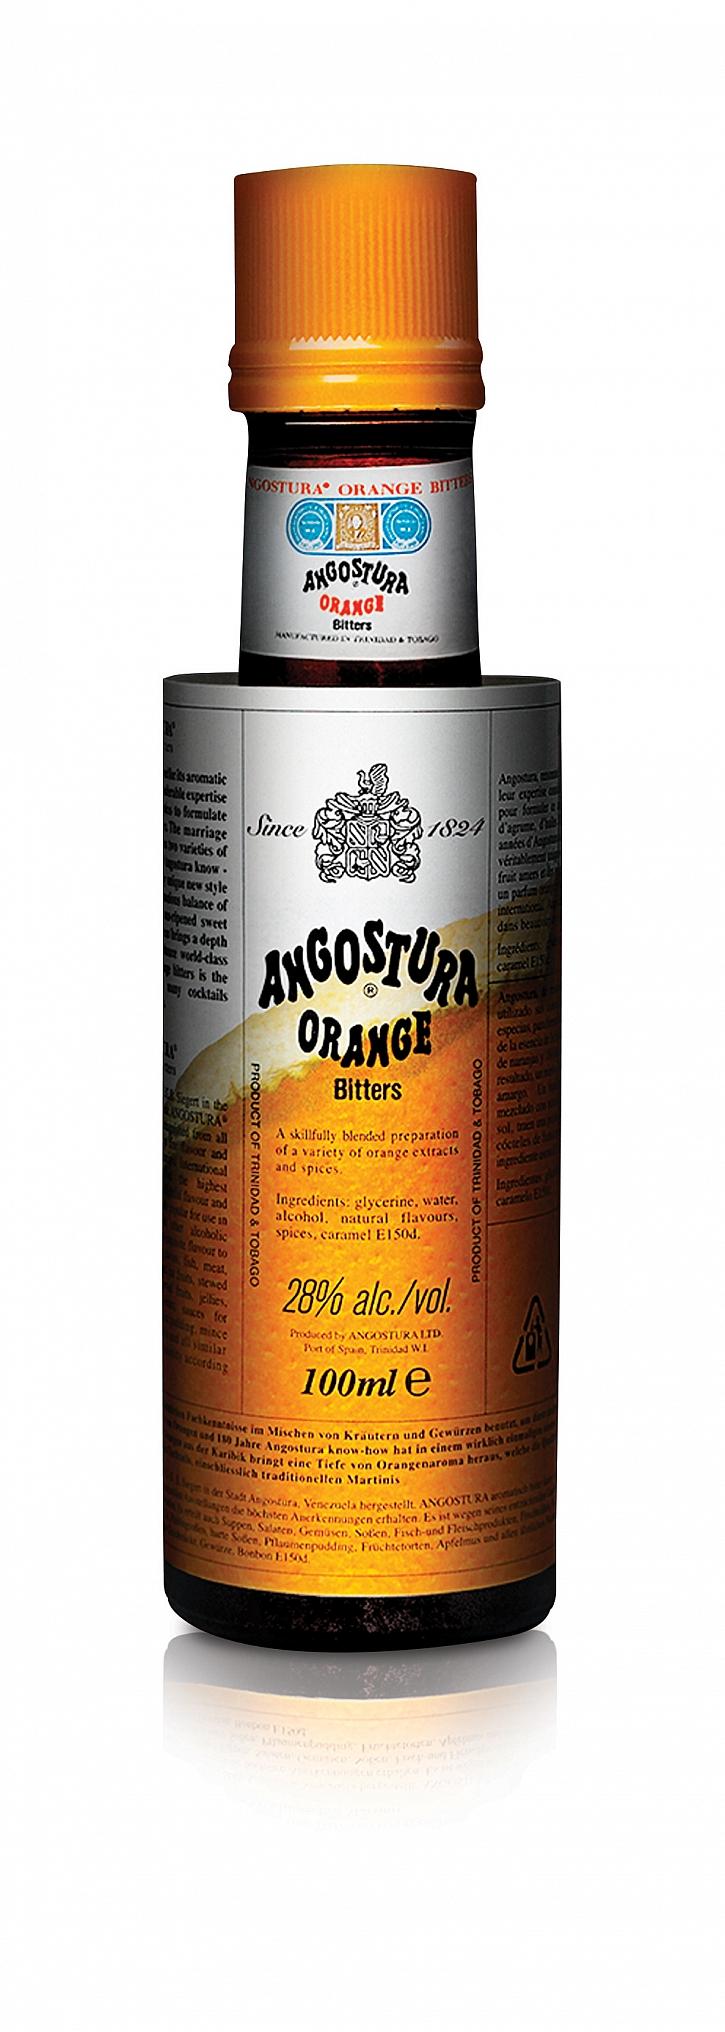 1878_Angostura_Orange_bitters1